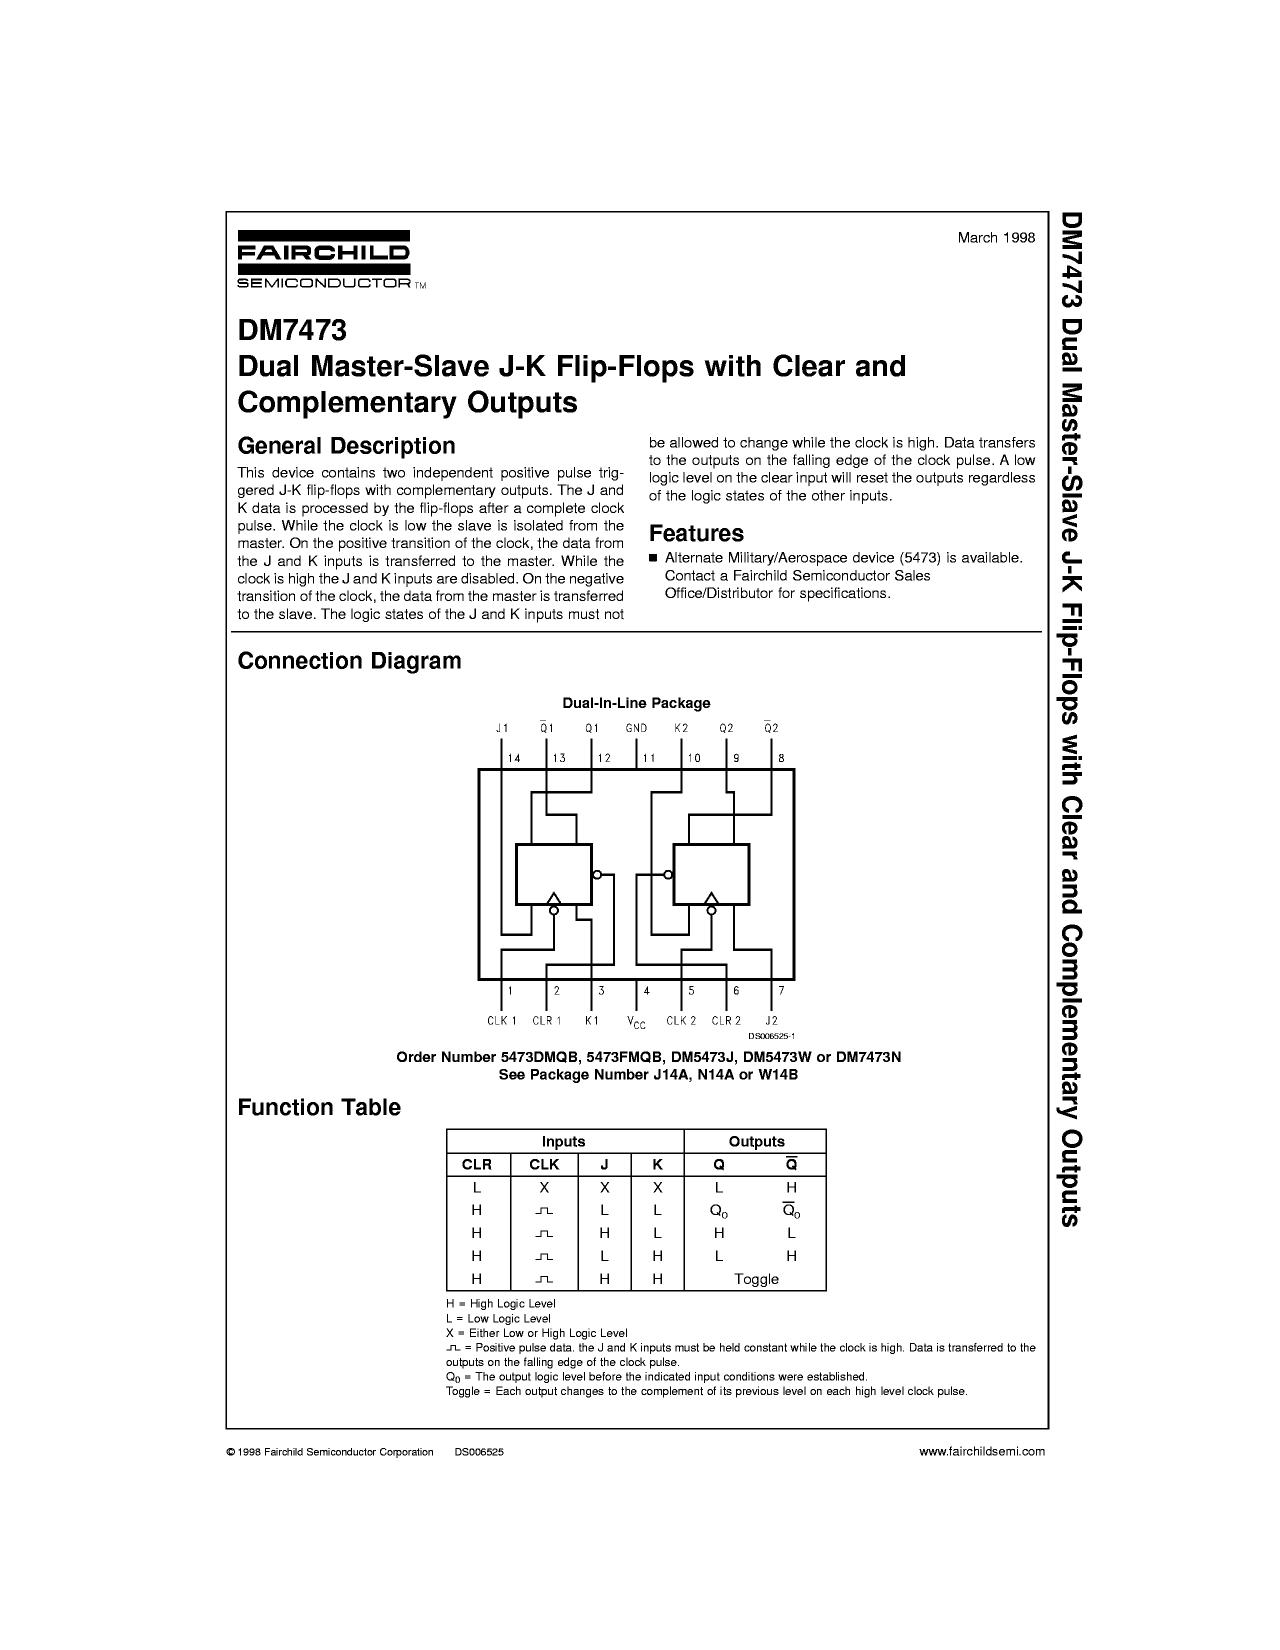 7473 datasheet pdf pinout dual master slave j k f f. Black Bedroom Furniture Sets. Home Design Ideas